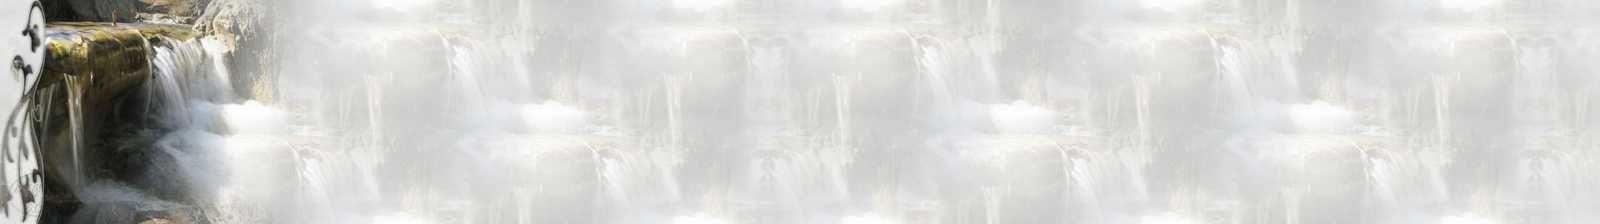 Paysage Corse Incredimail &amp&#x3B; Papier A4 h l  &amp&#x3B; outlook &amp&#x3B; enveloppe &amp&#x3B; 2 cartes A5 &amp&#x3B; signets 3 langues    pays_corse_4_00_claudine